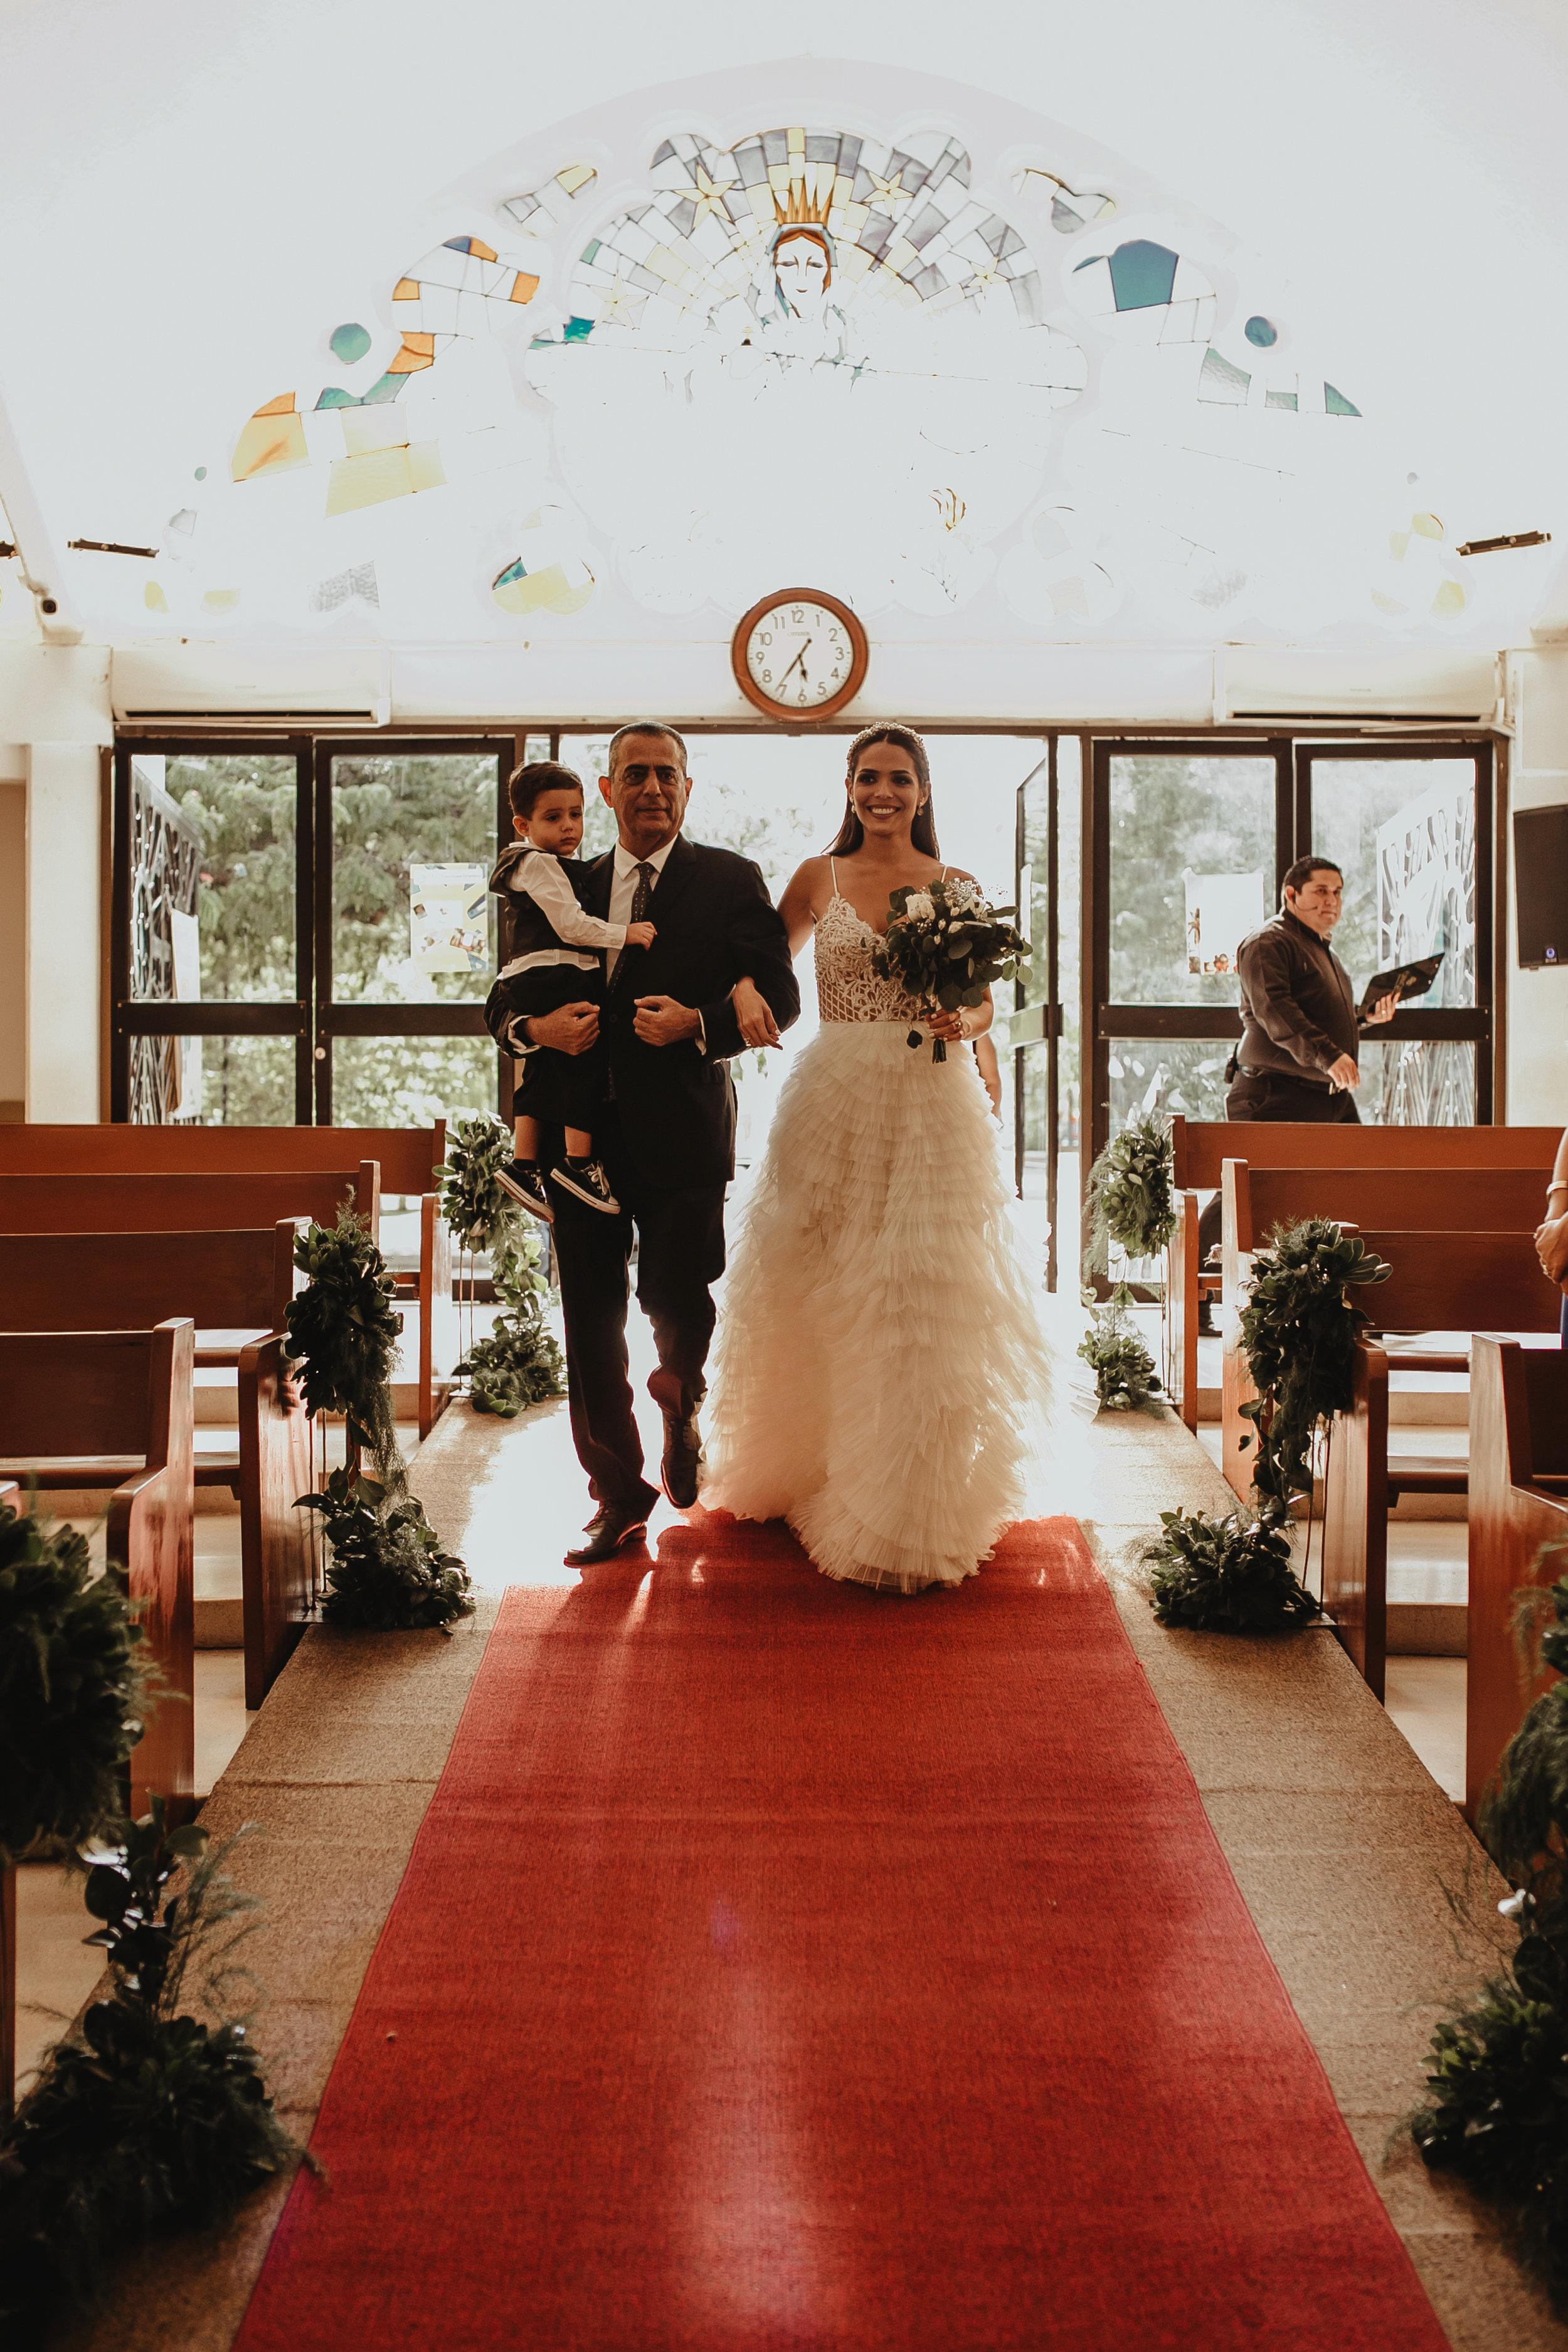 0572R&F__WeddingDestination_Weddingmerida_BodaMexico_FotografoDeBodas_FabrizioSimoneenFotografo.jpg